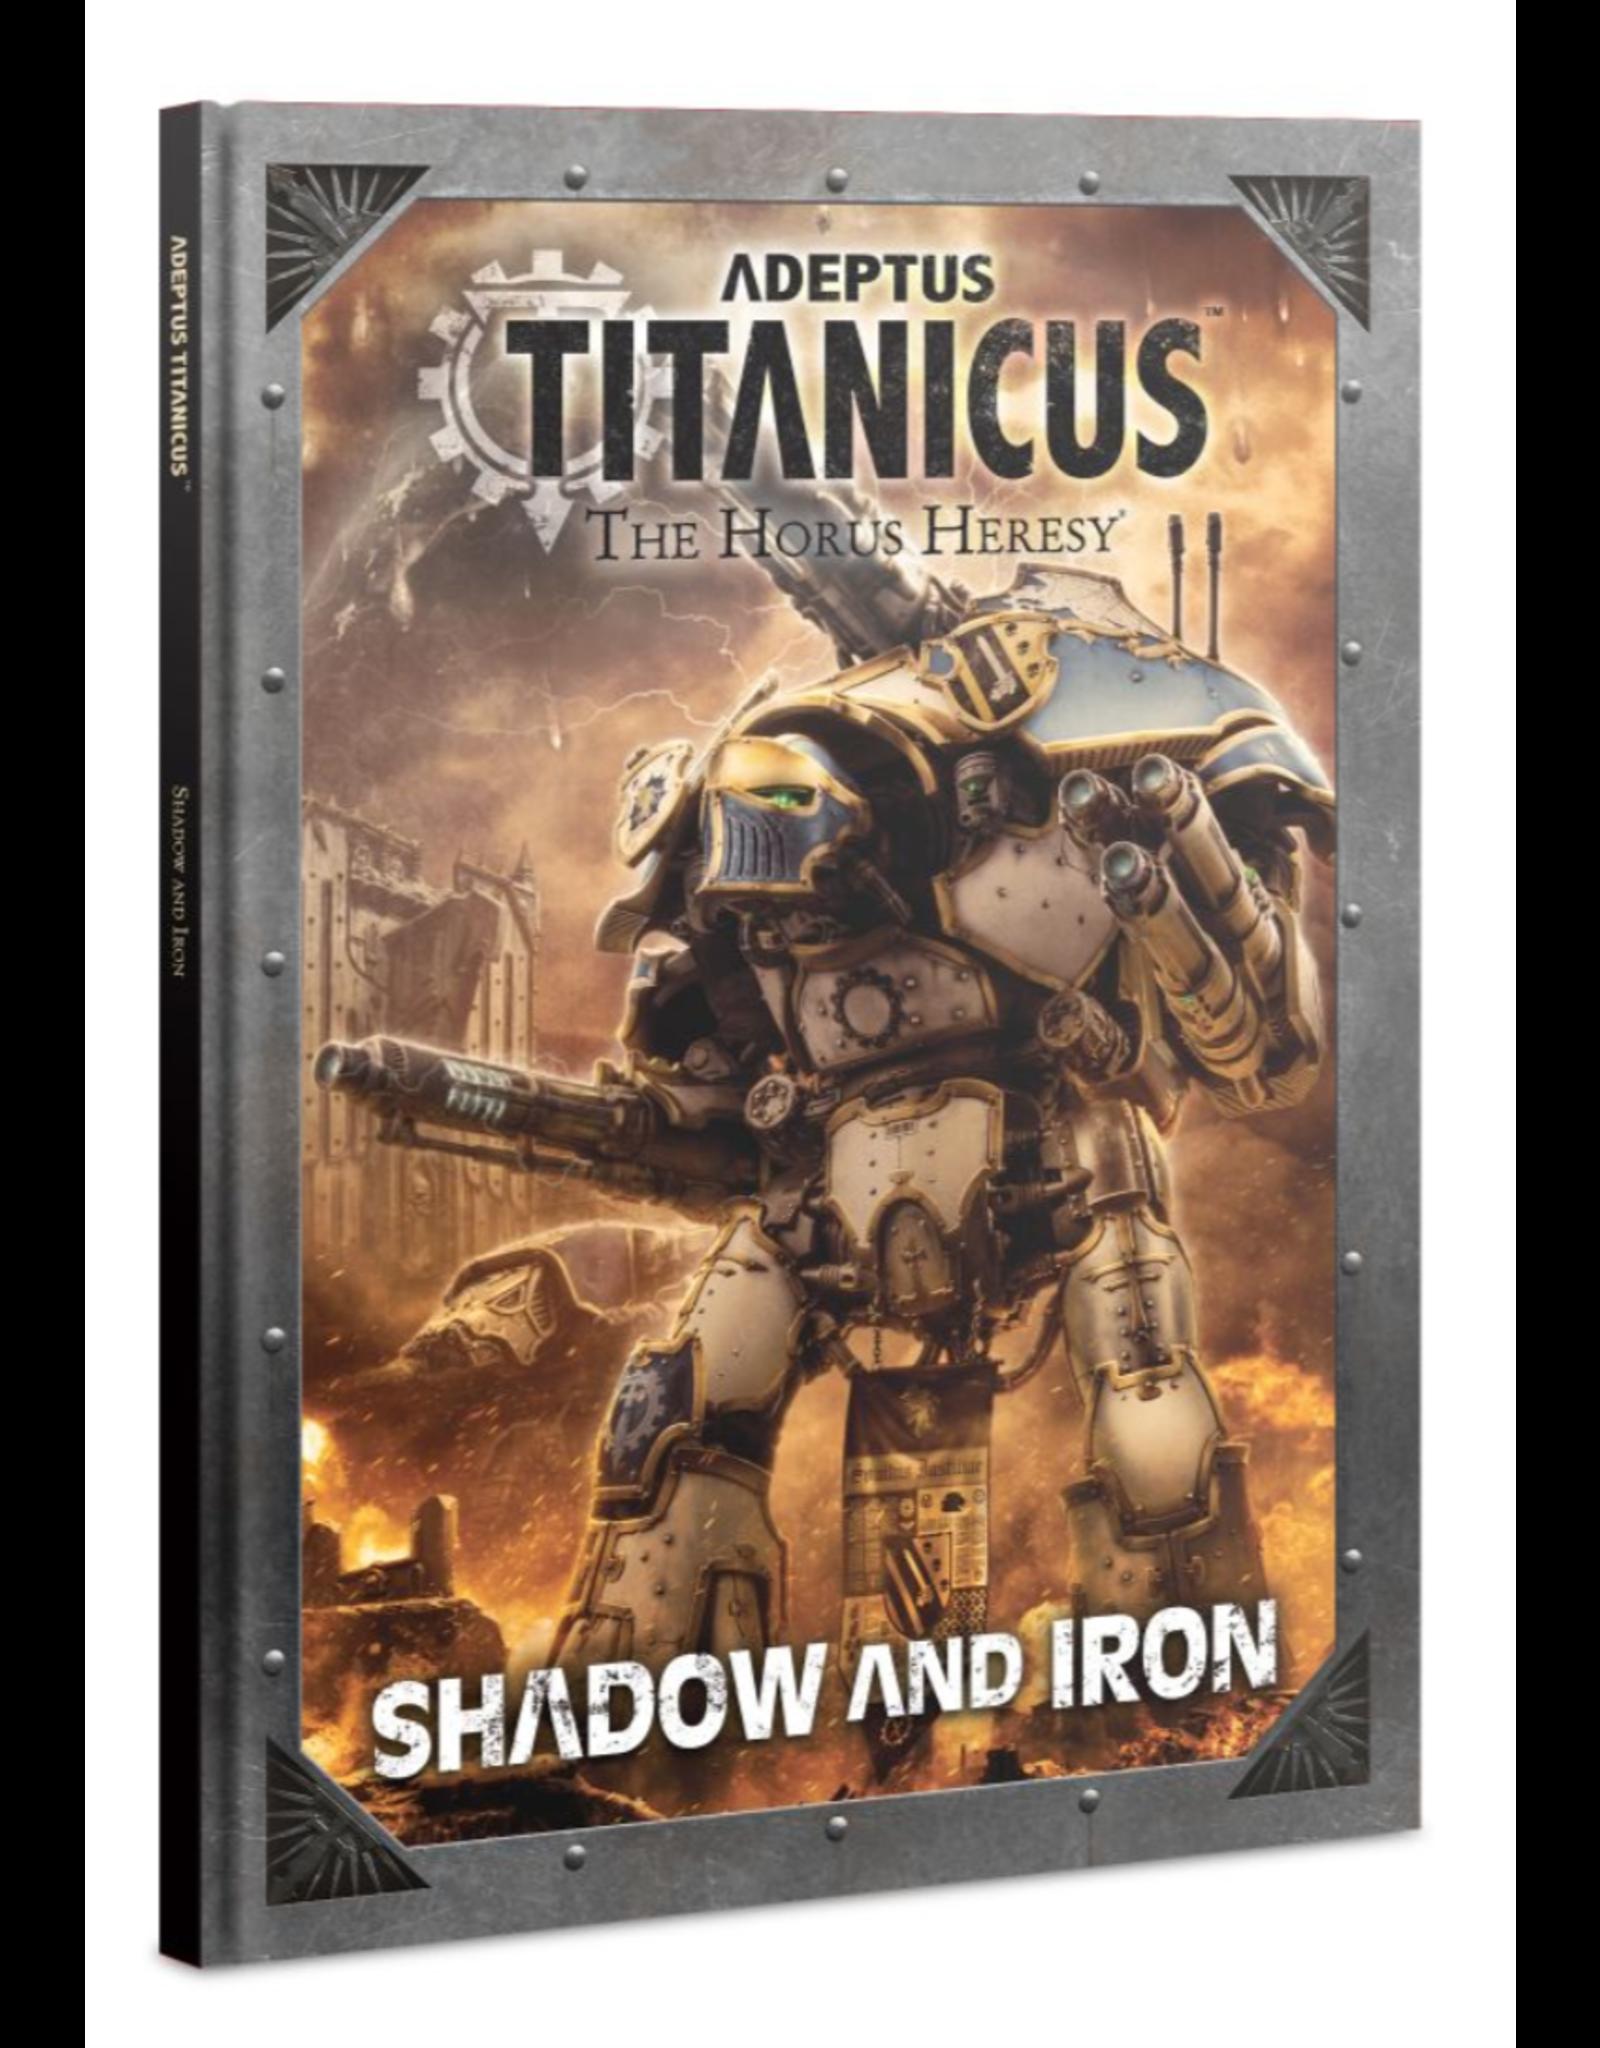 Warhammer 40K Adeptus Titanicus: Shadow and Iron